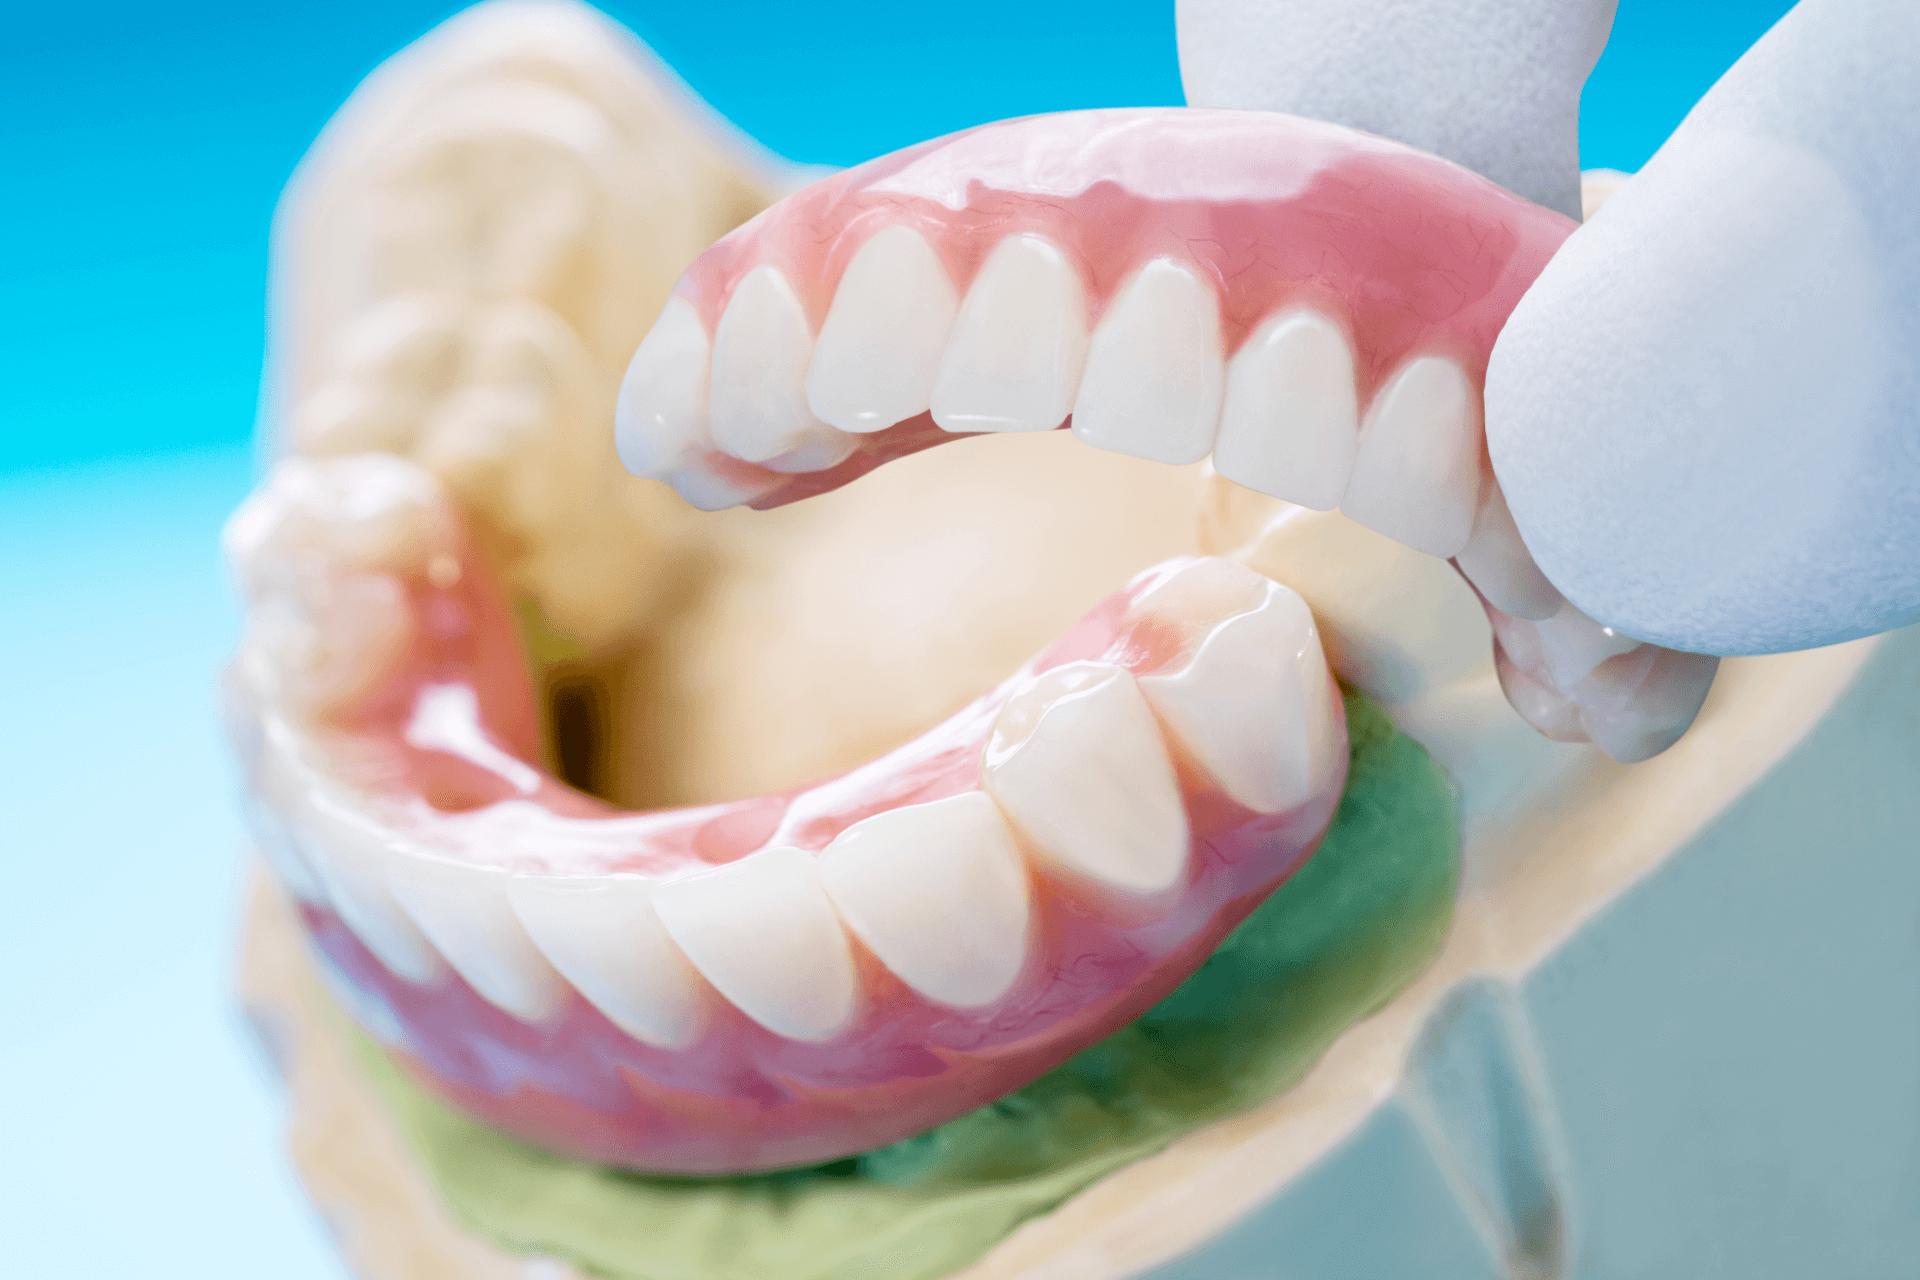 dentures kingman az kingman family dentistry